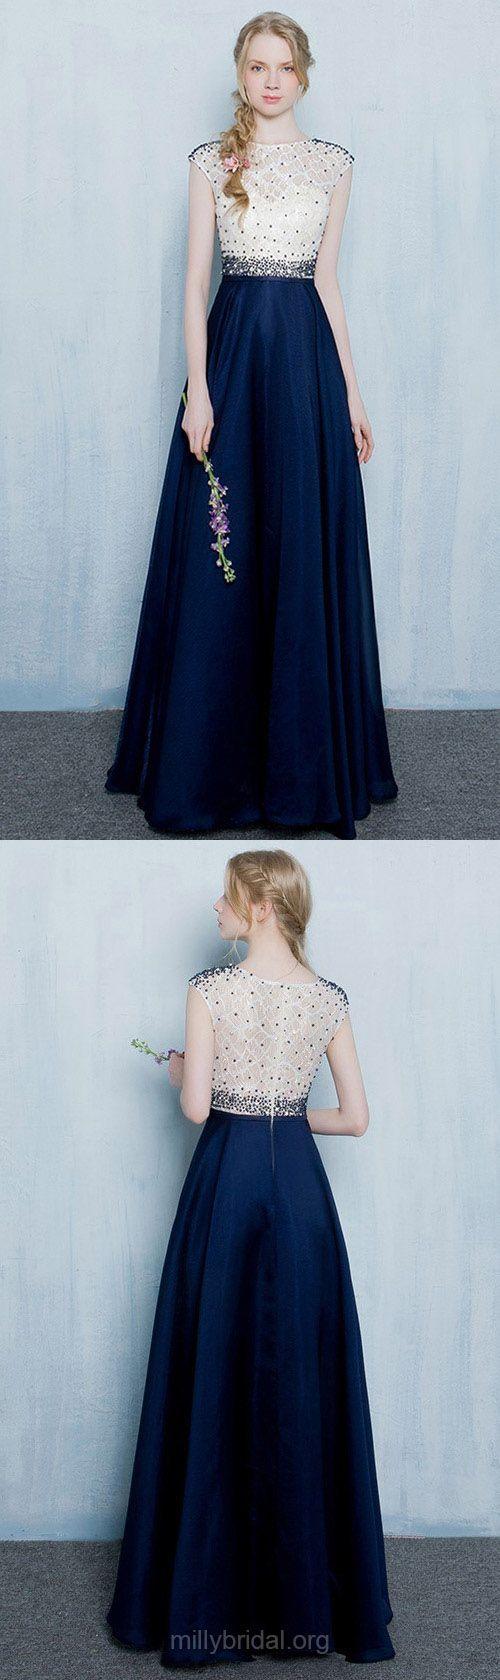 Royal blue prom dresses lace party dresses long aline formal